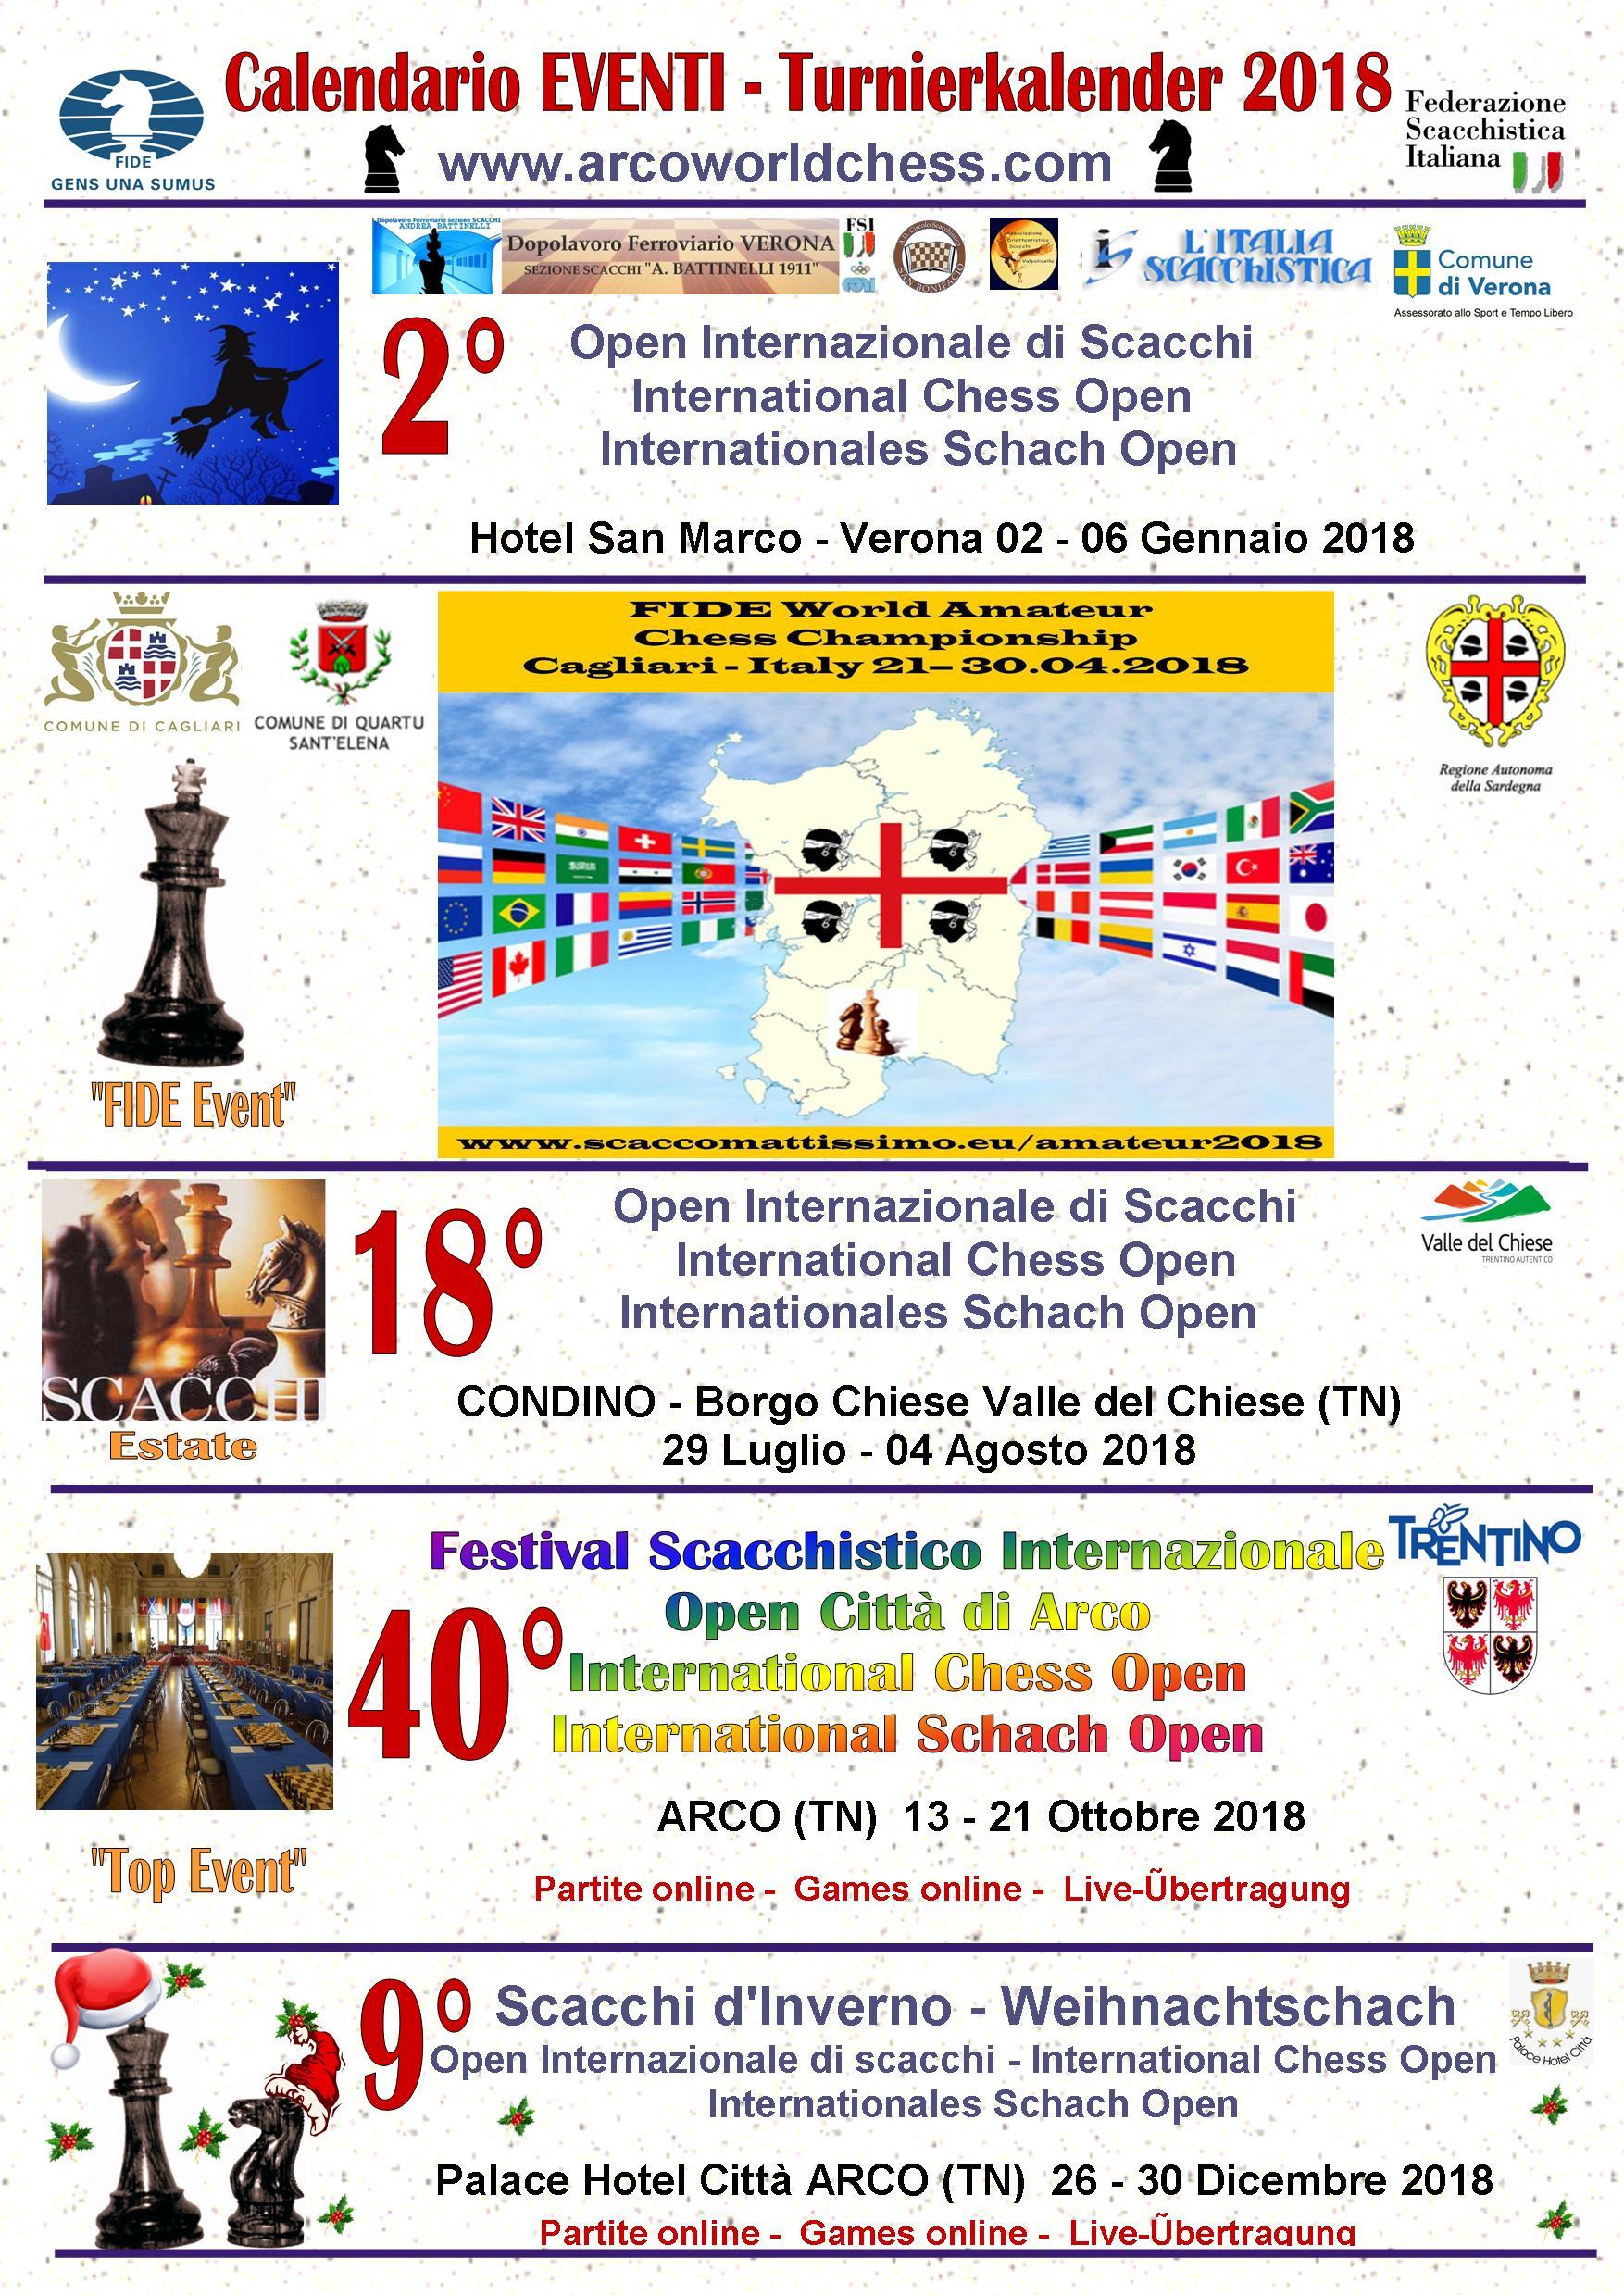 Calendario Tornei Scacchi.Calendario 2018 Arcoworldchess Com